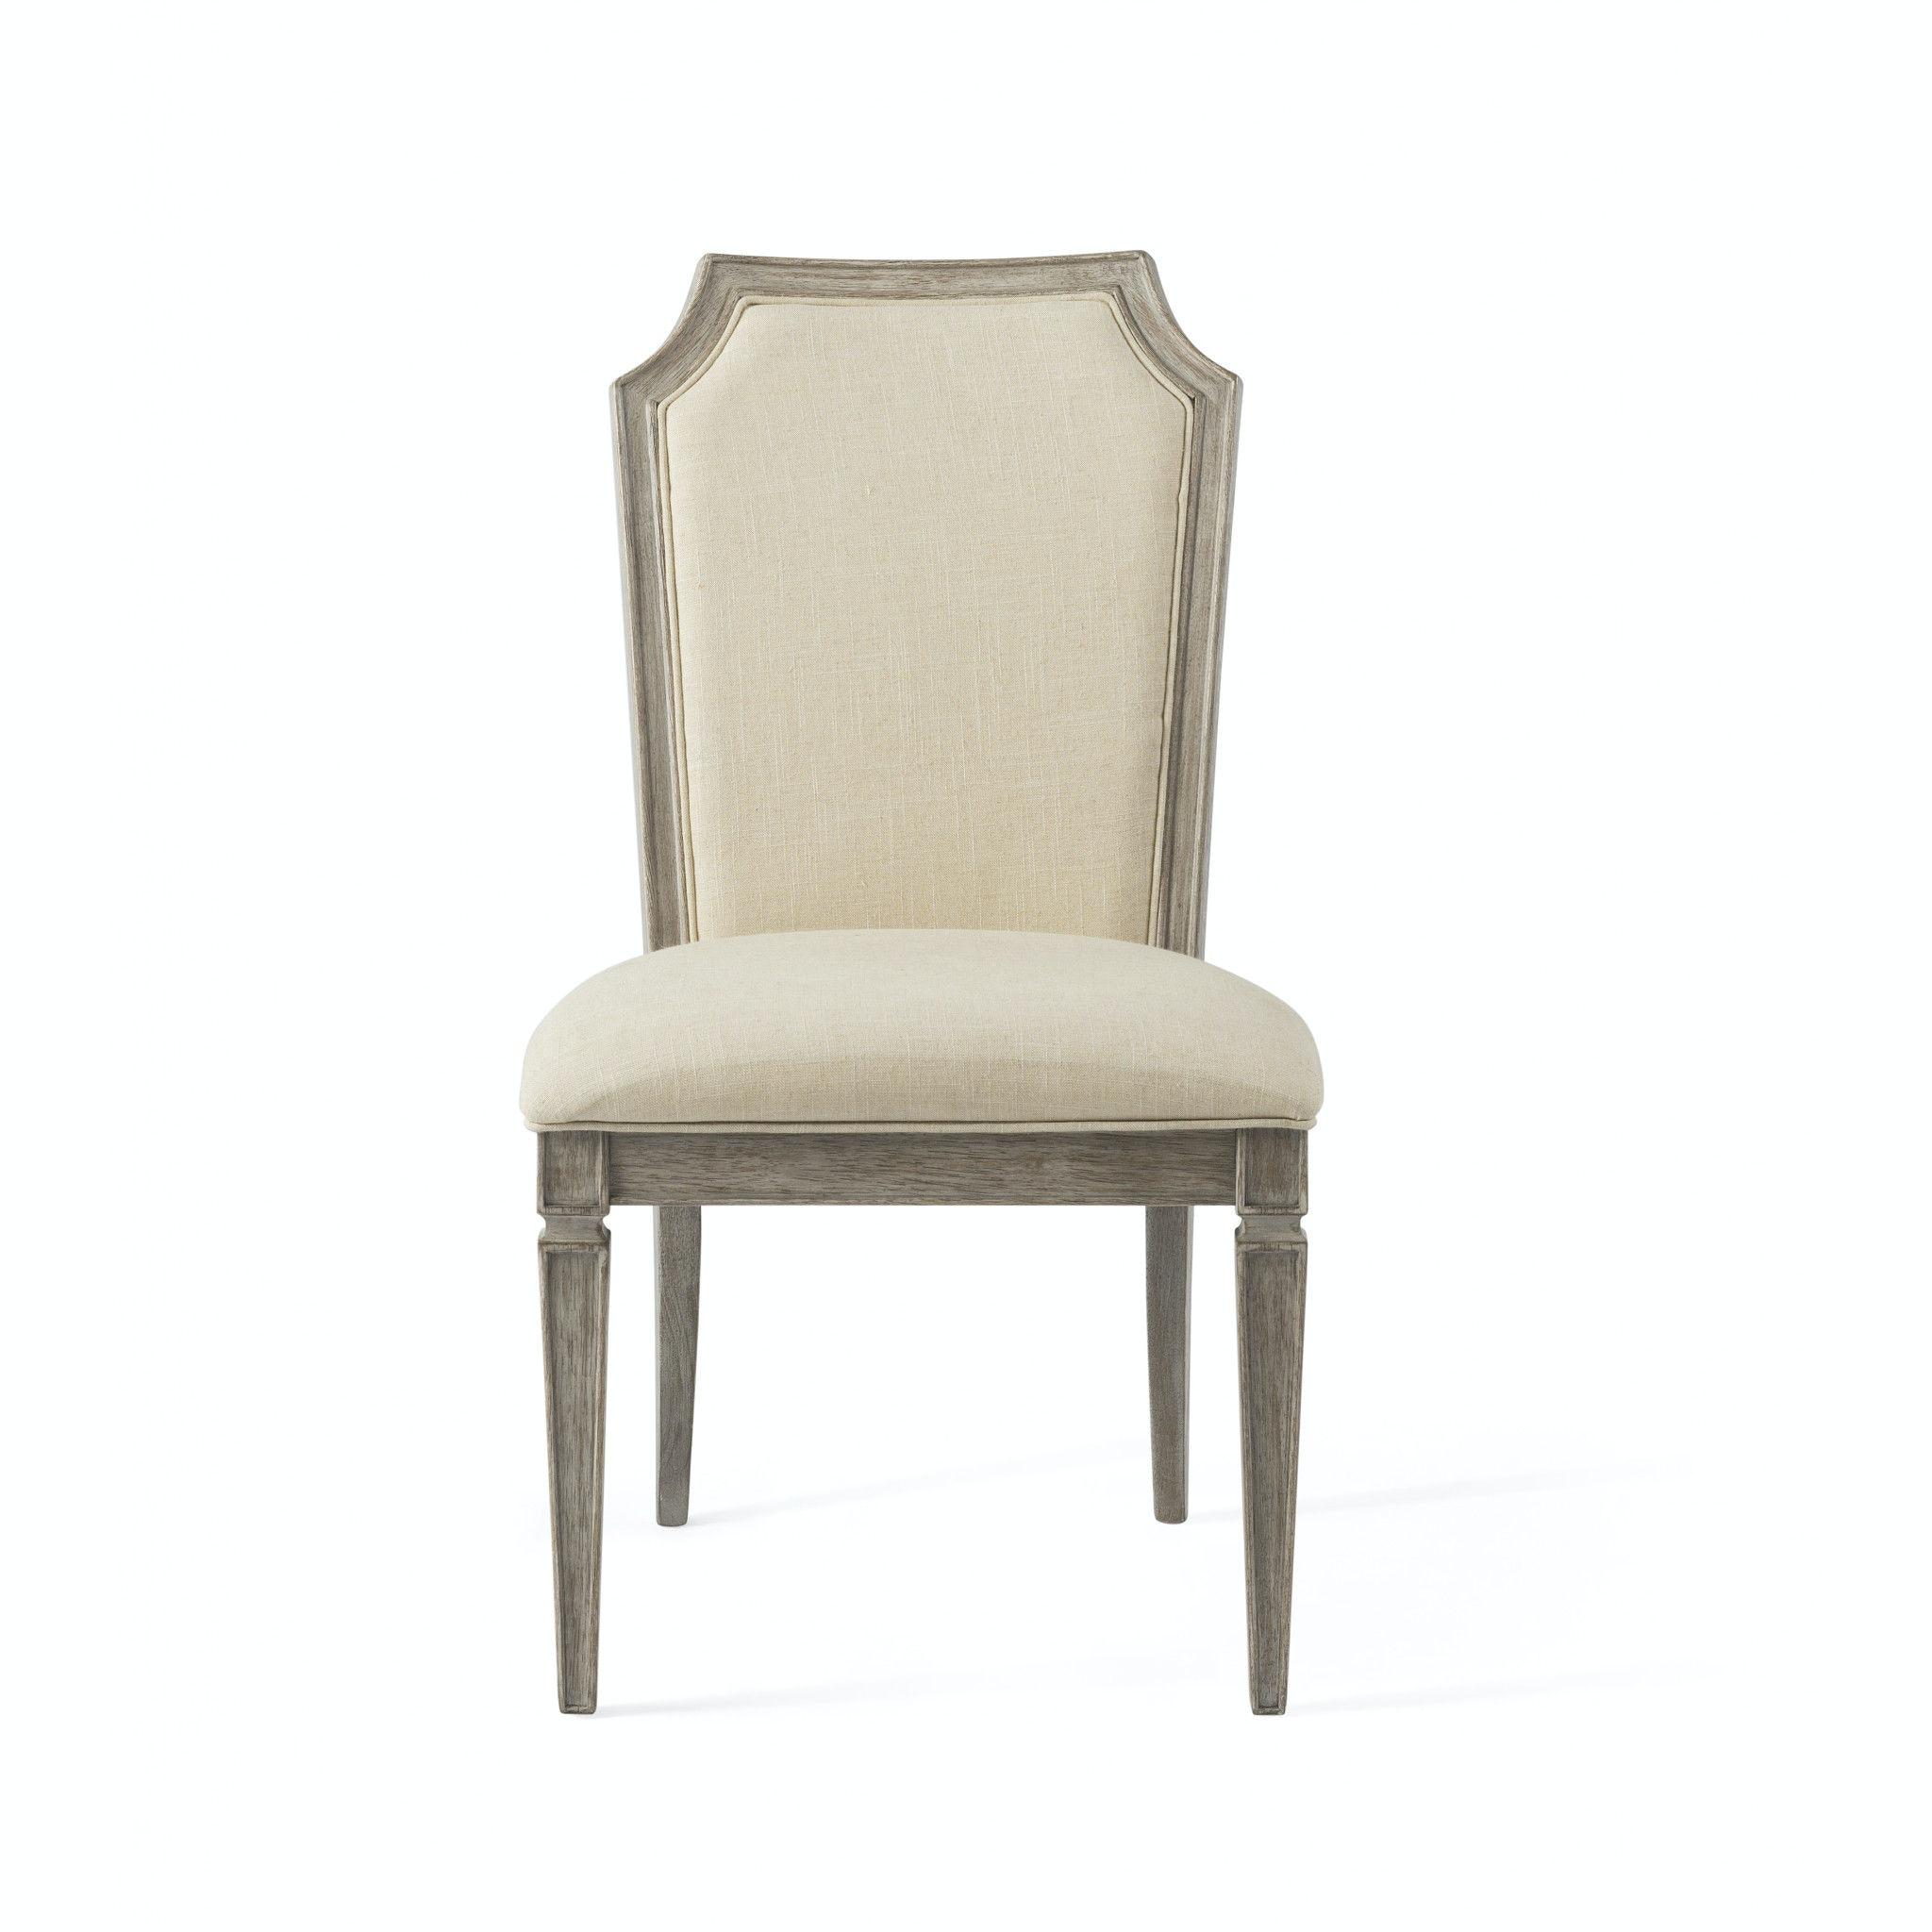 1153 DR 800. Bellamy Side Chair